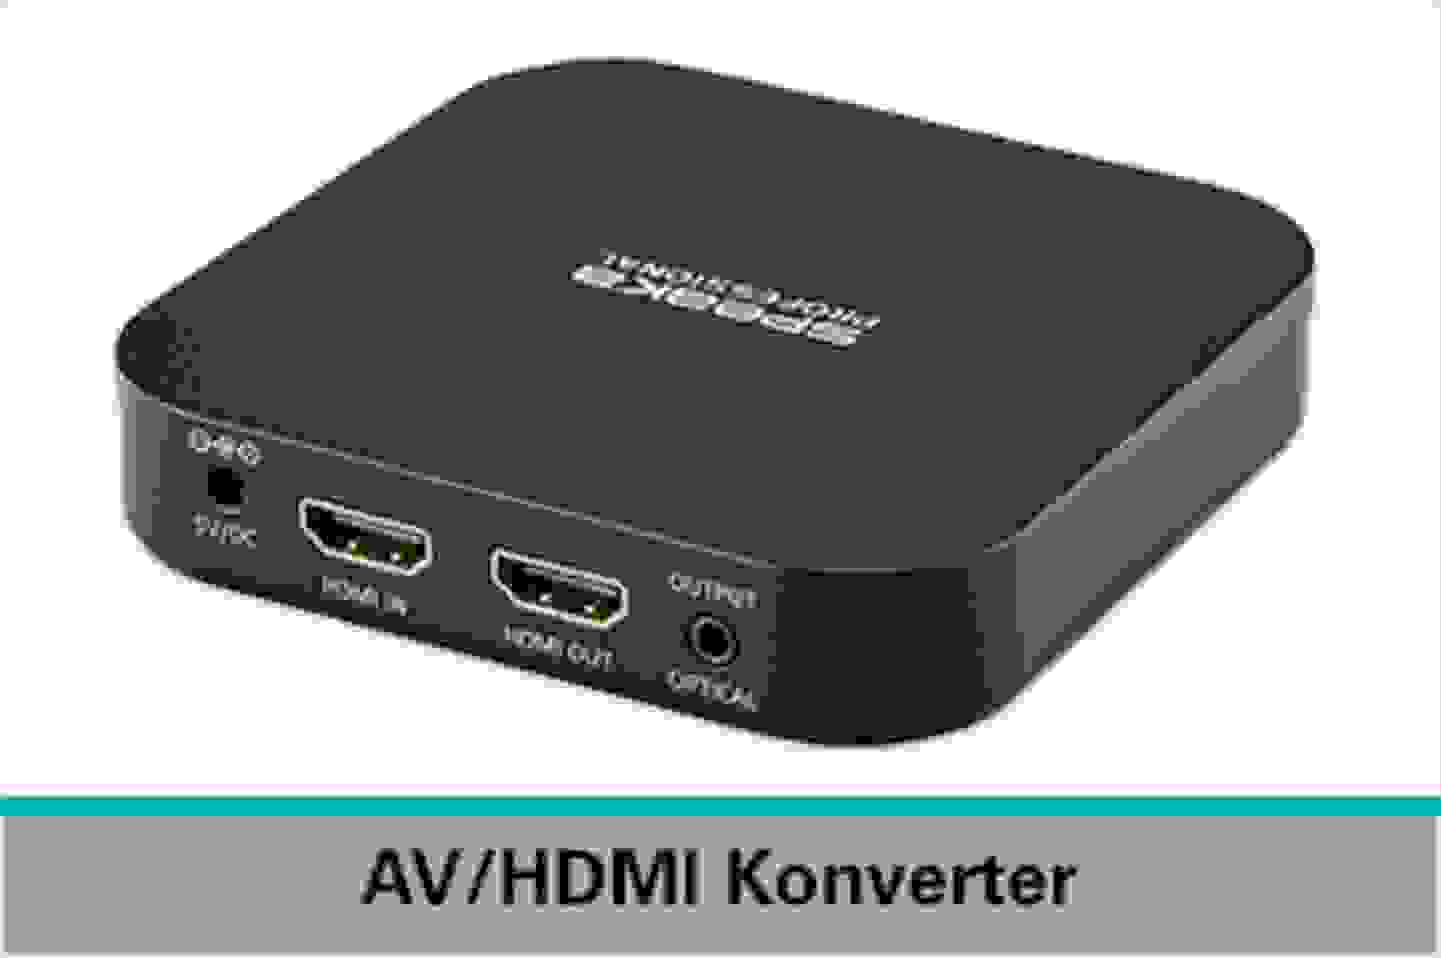 Speaka Professional AV/HDMI Konverter